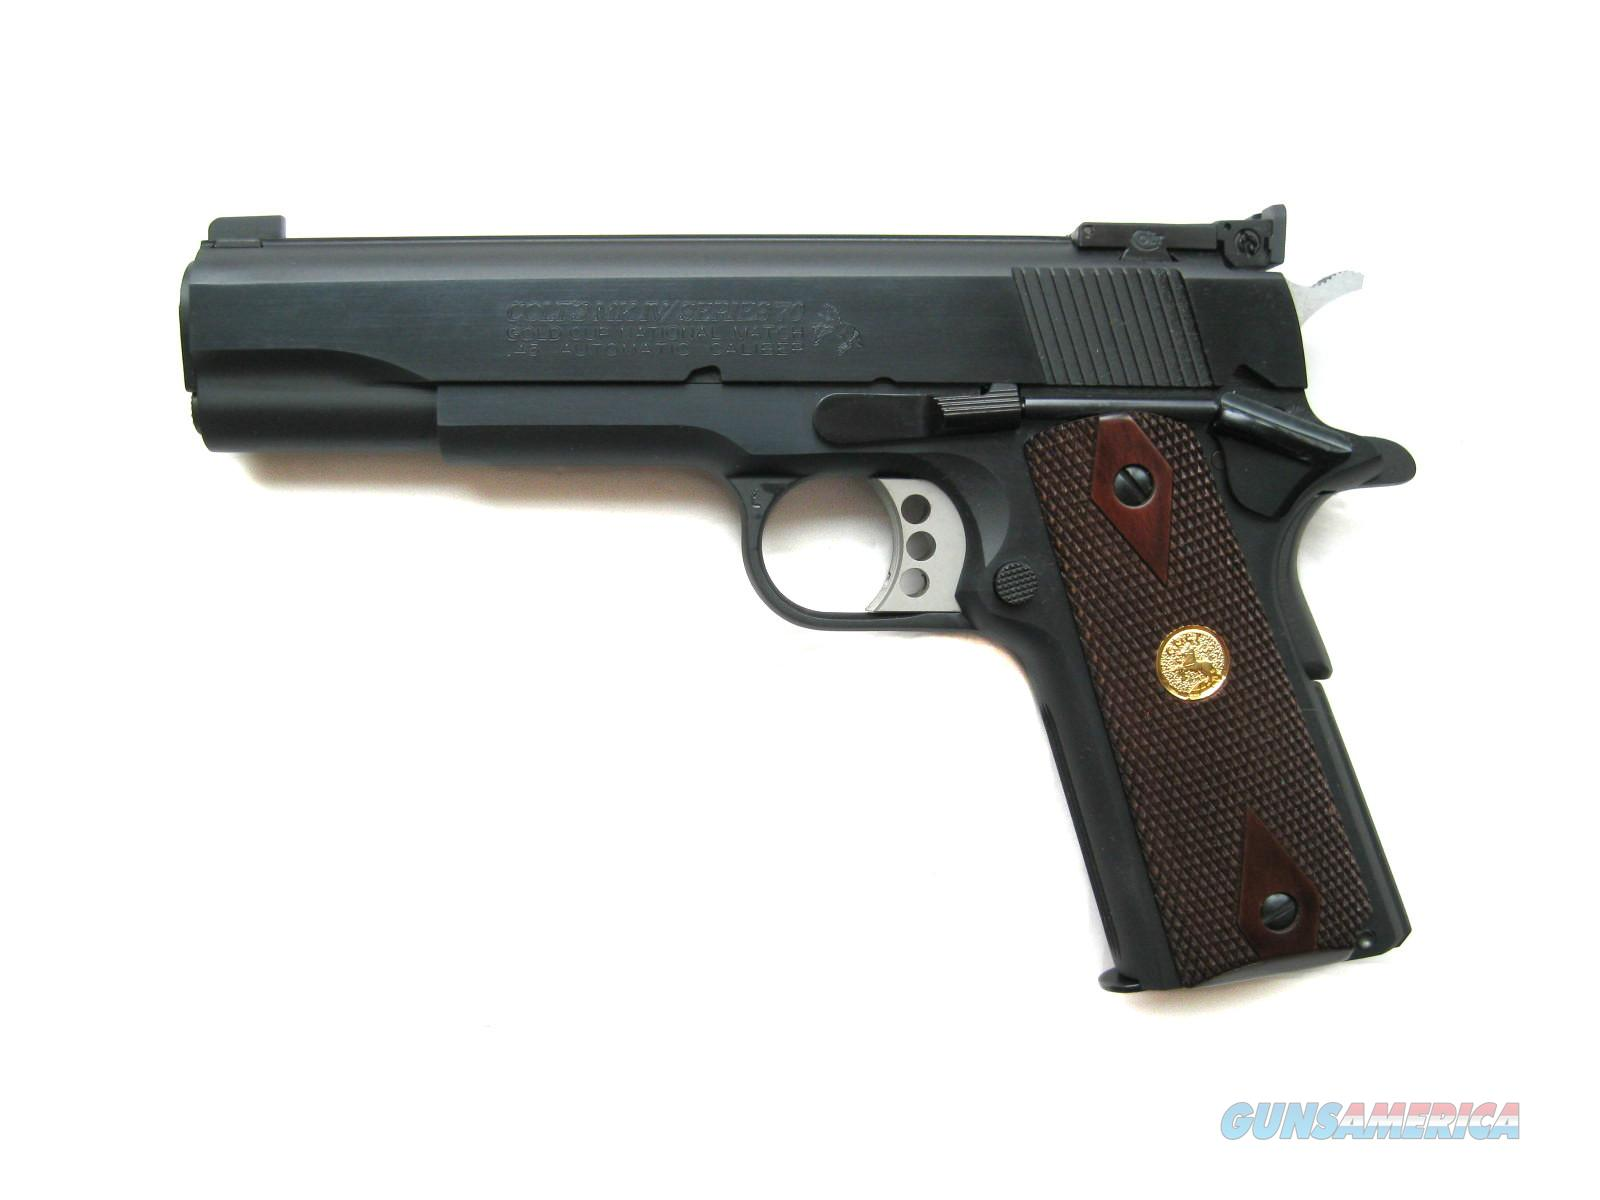 Colt Gold Cup National Match 1911 .45 acp 70 Series O5870A1 *NEW*  Guns > Pistols > Colt Automatic Pistols (1911 & Var)